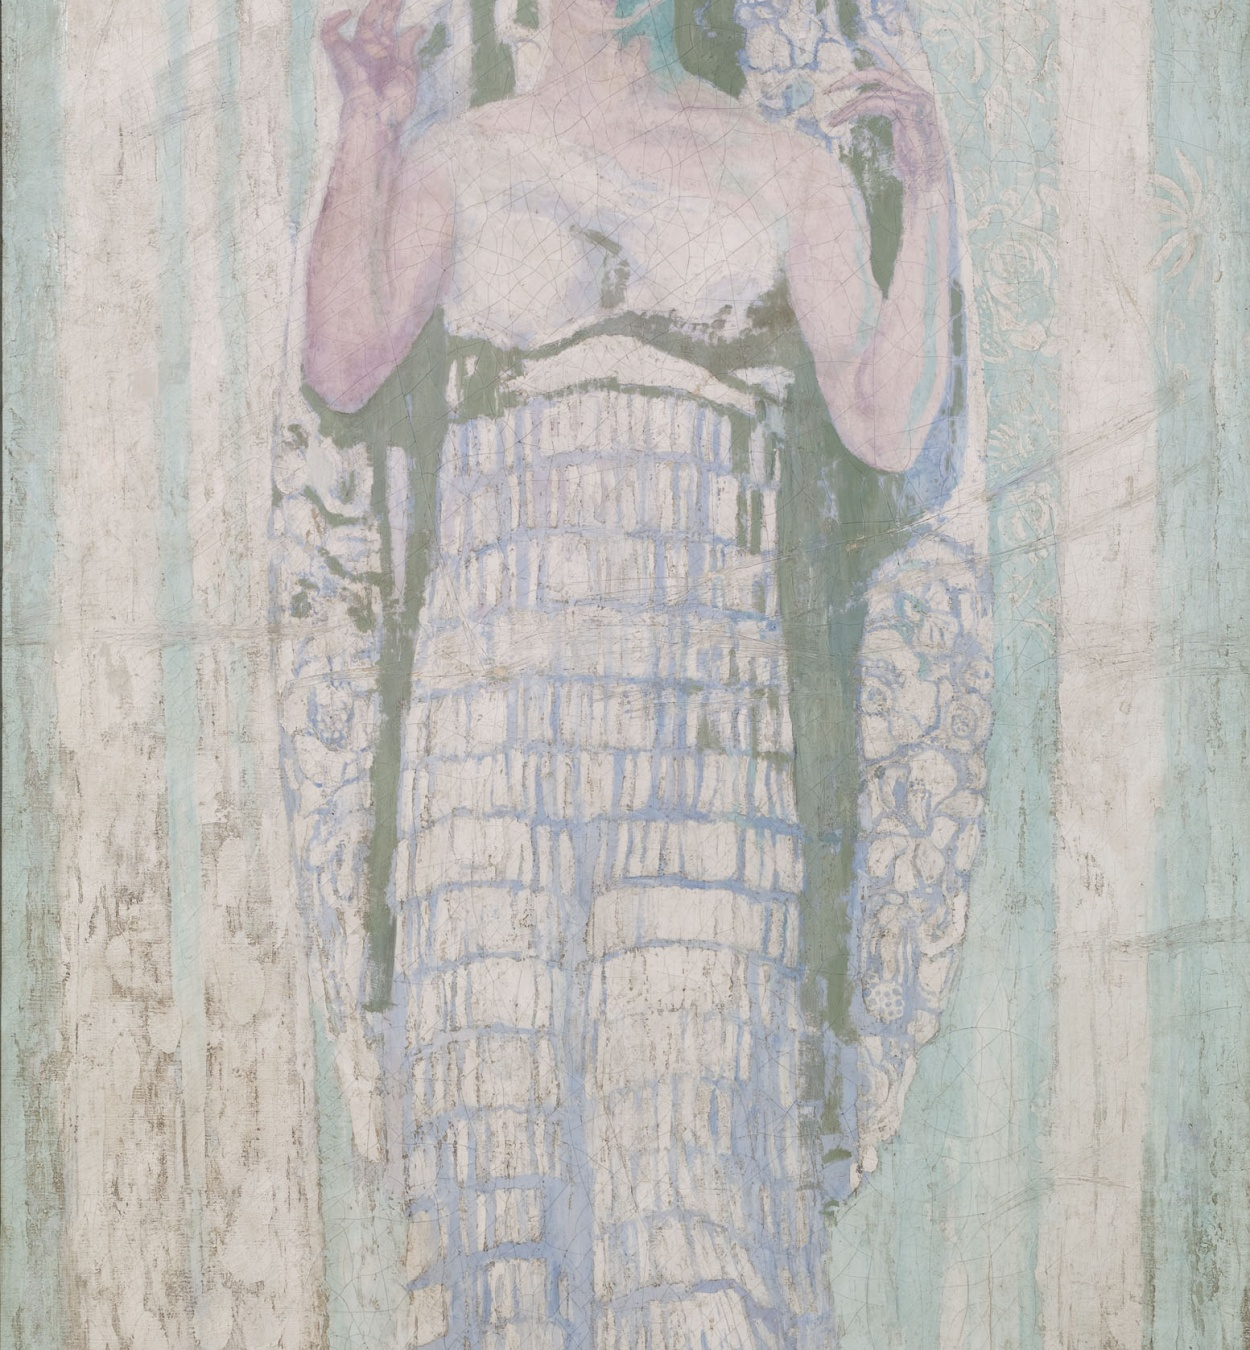 Hermen Anglada Camarasa - Portrait of Magda Jocelyn - Circa 1904